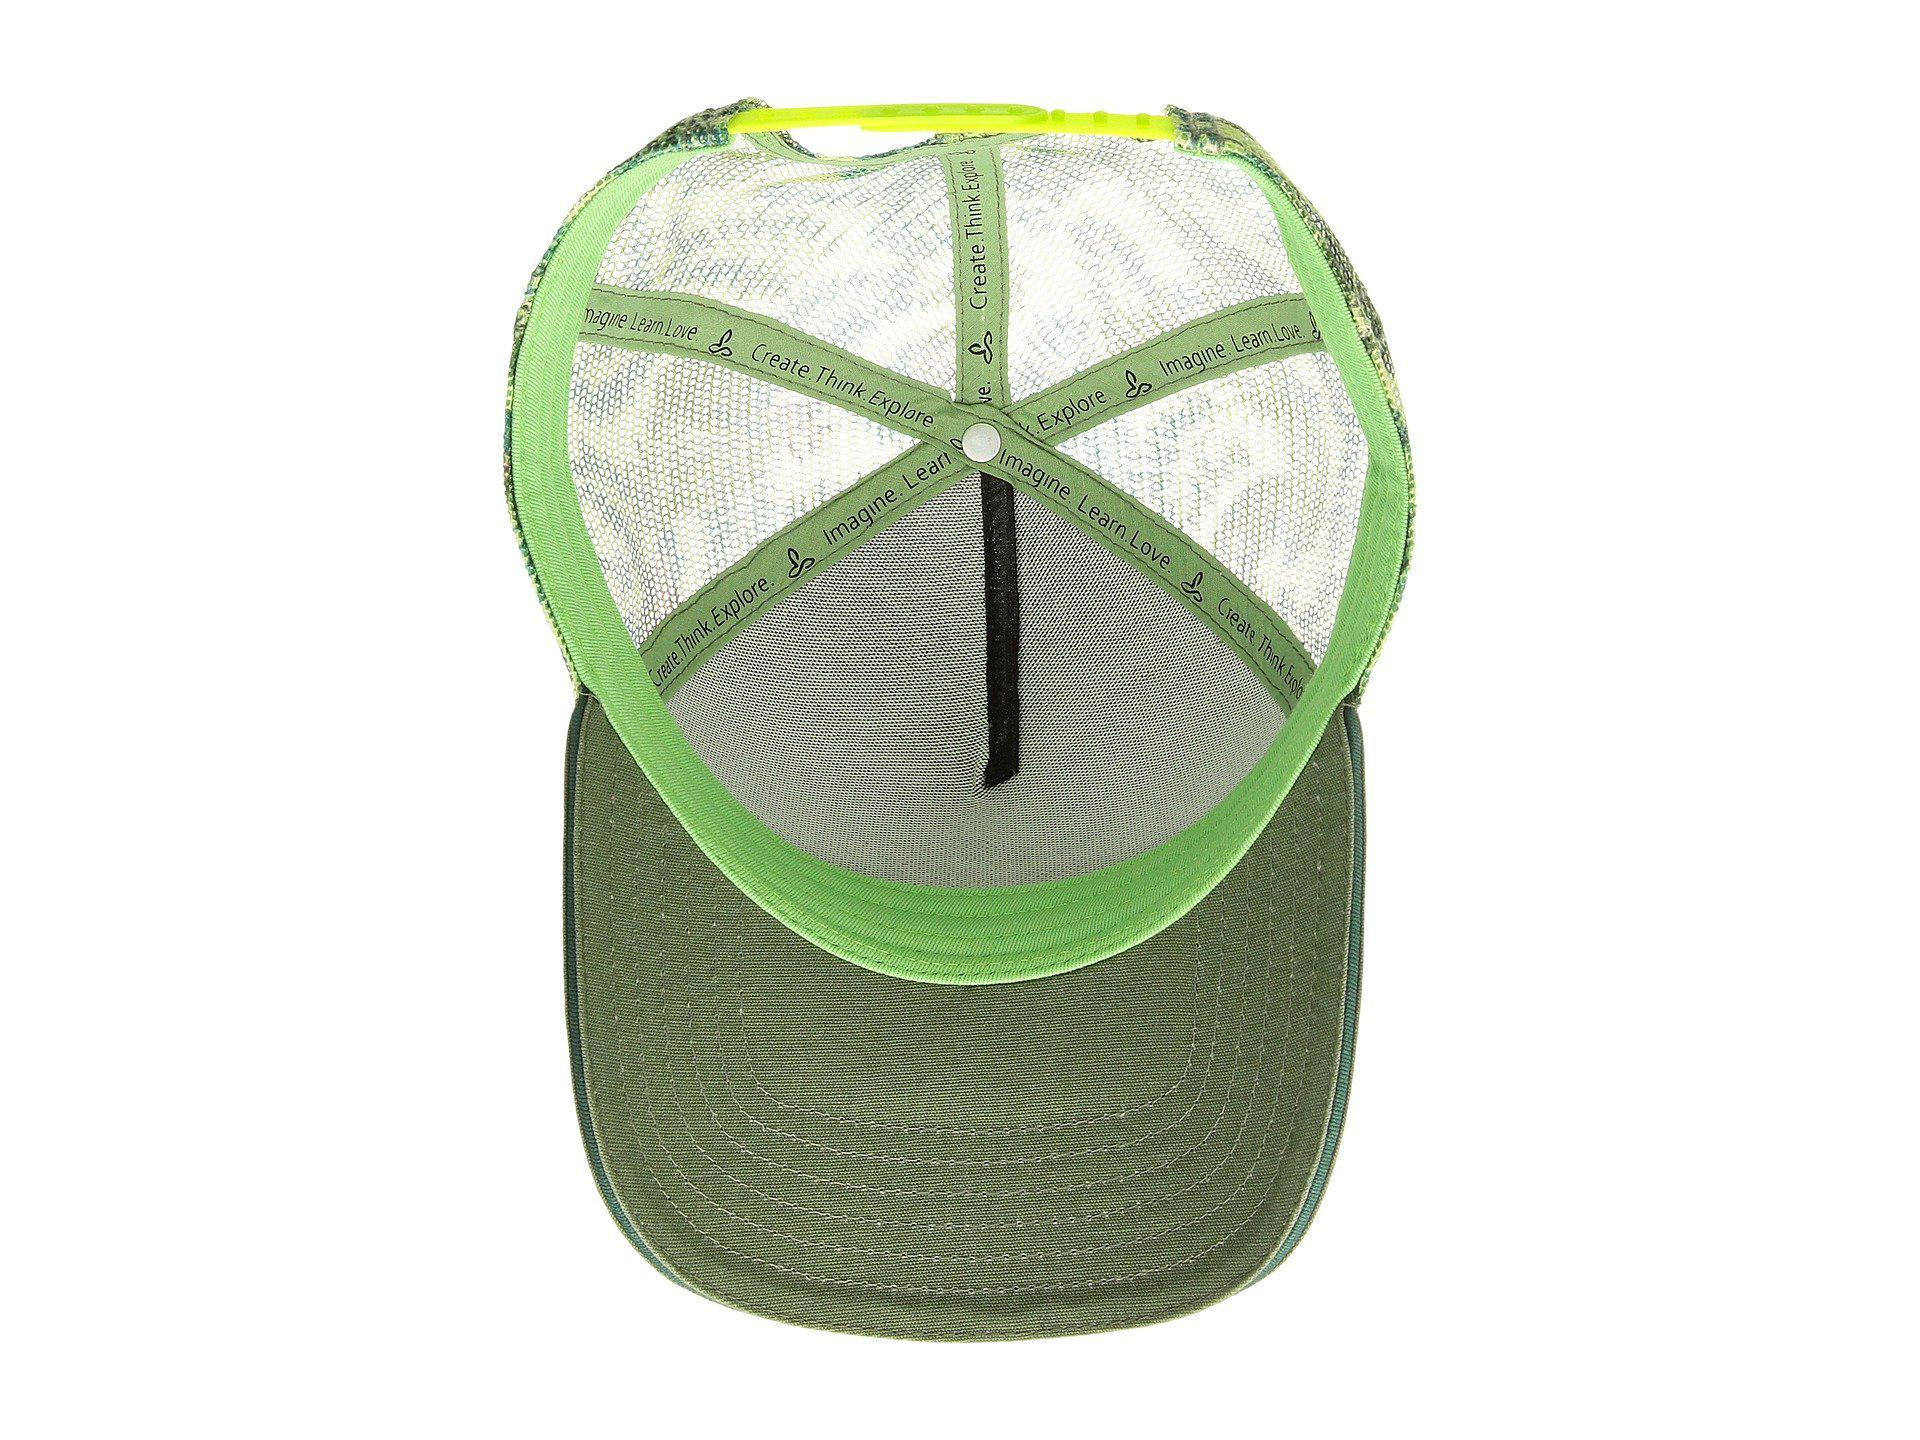 733cd2962ed89b Gallery. Previously sold at: Zappos · Women's Von Dutch Trucker Hats ...